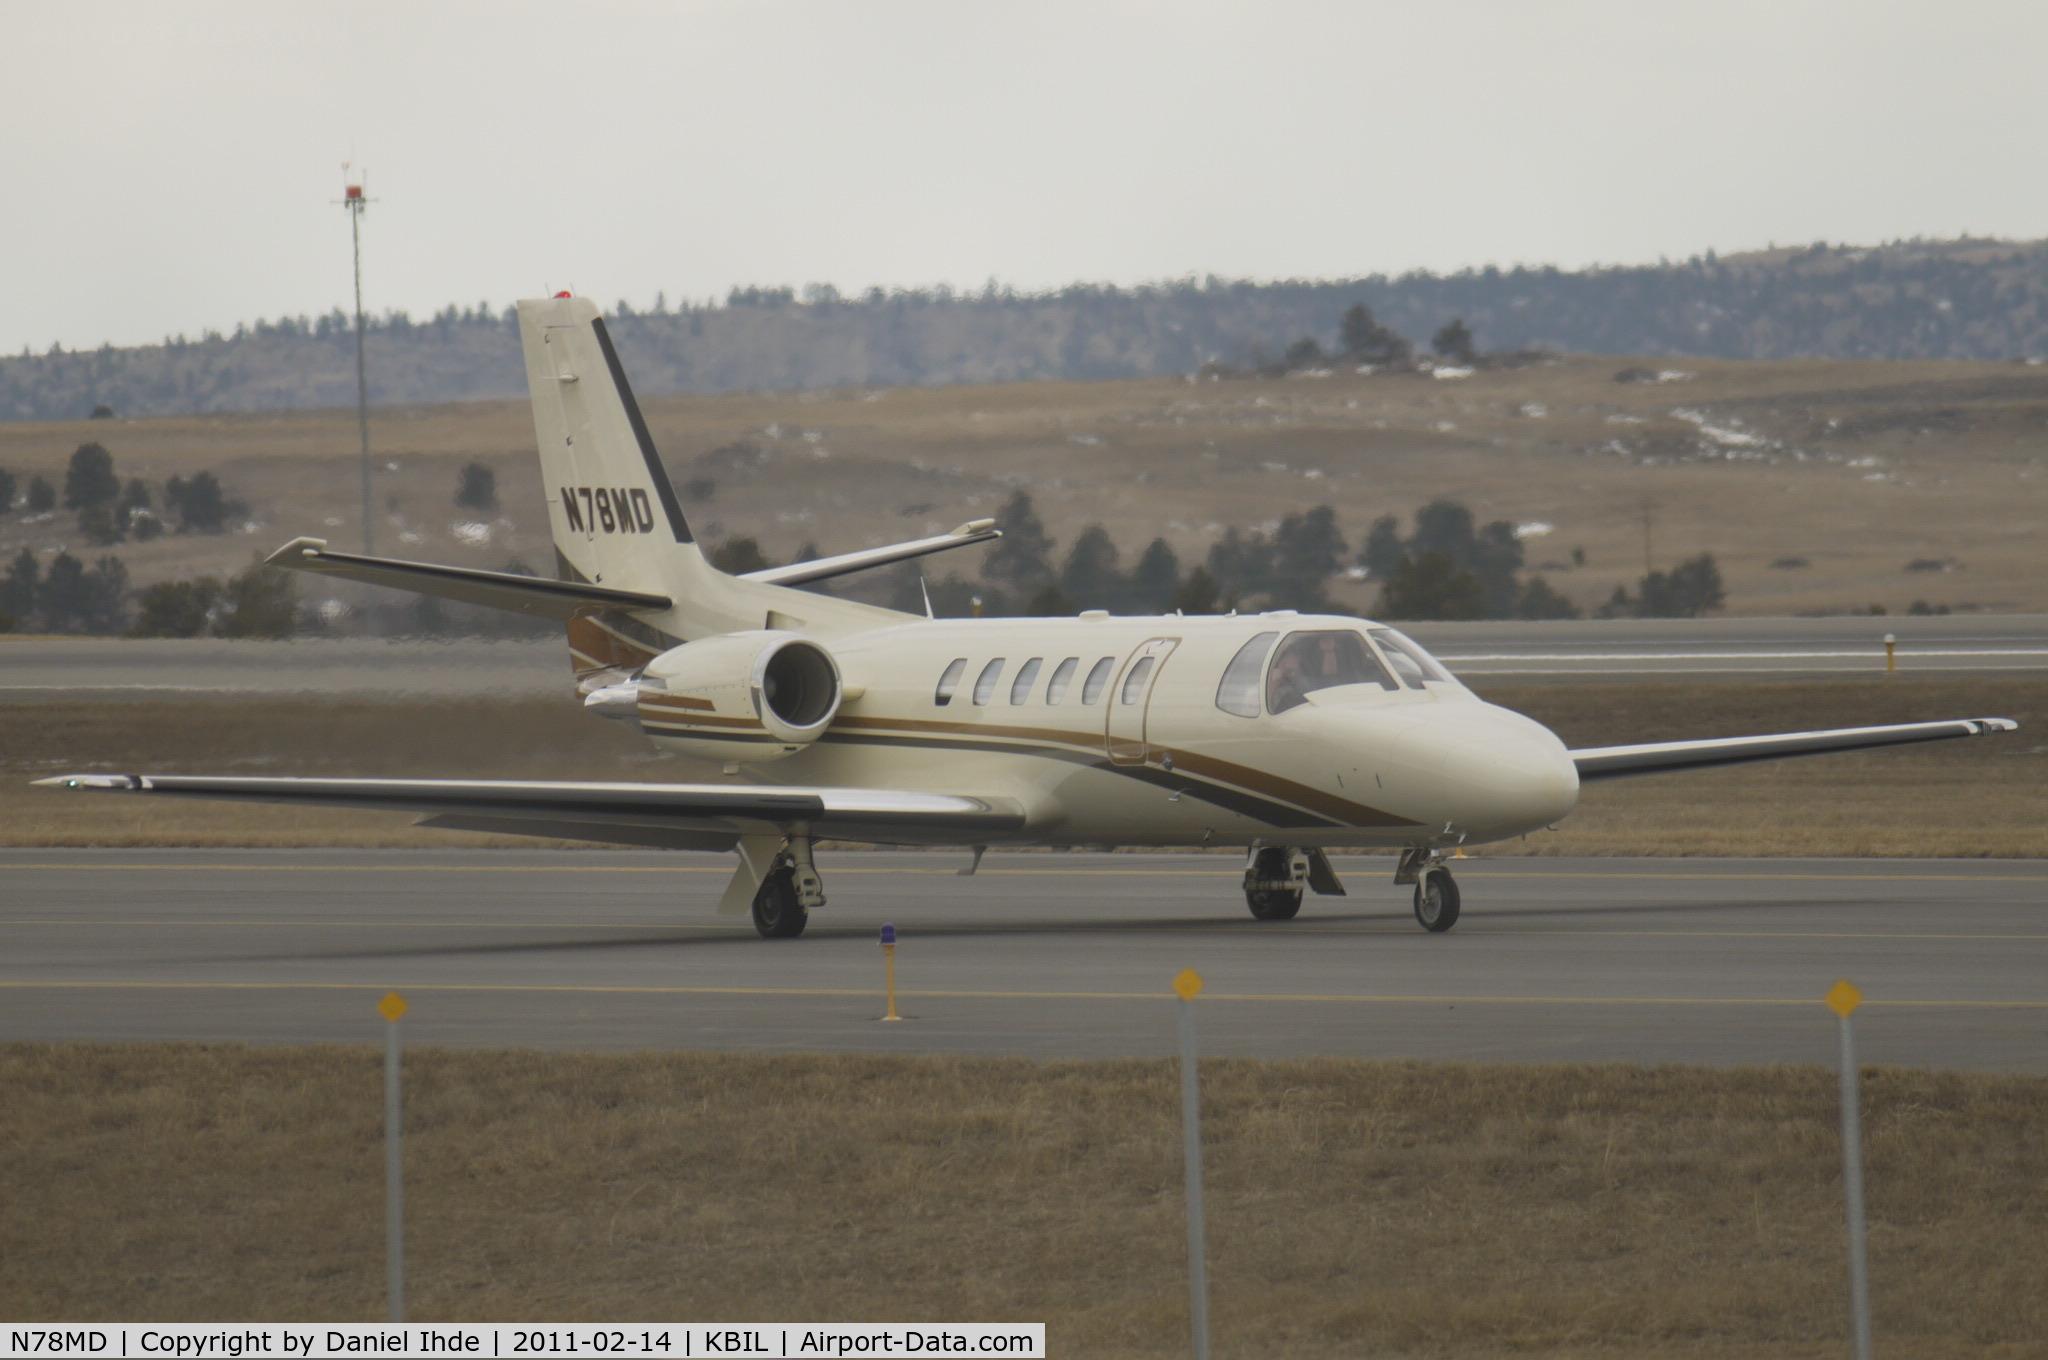 N78MD, 2001 Cessna 550 C/N 550-0970, Cessna Citation 550 taxi's to 28R at Billings Logan